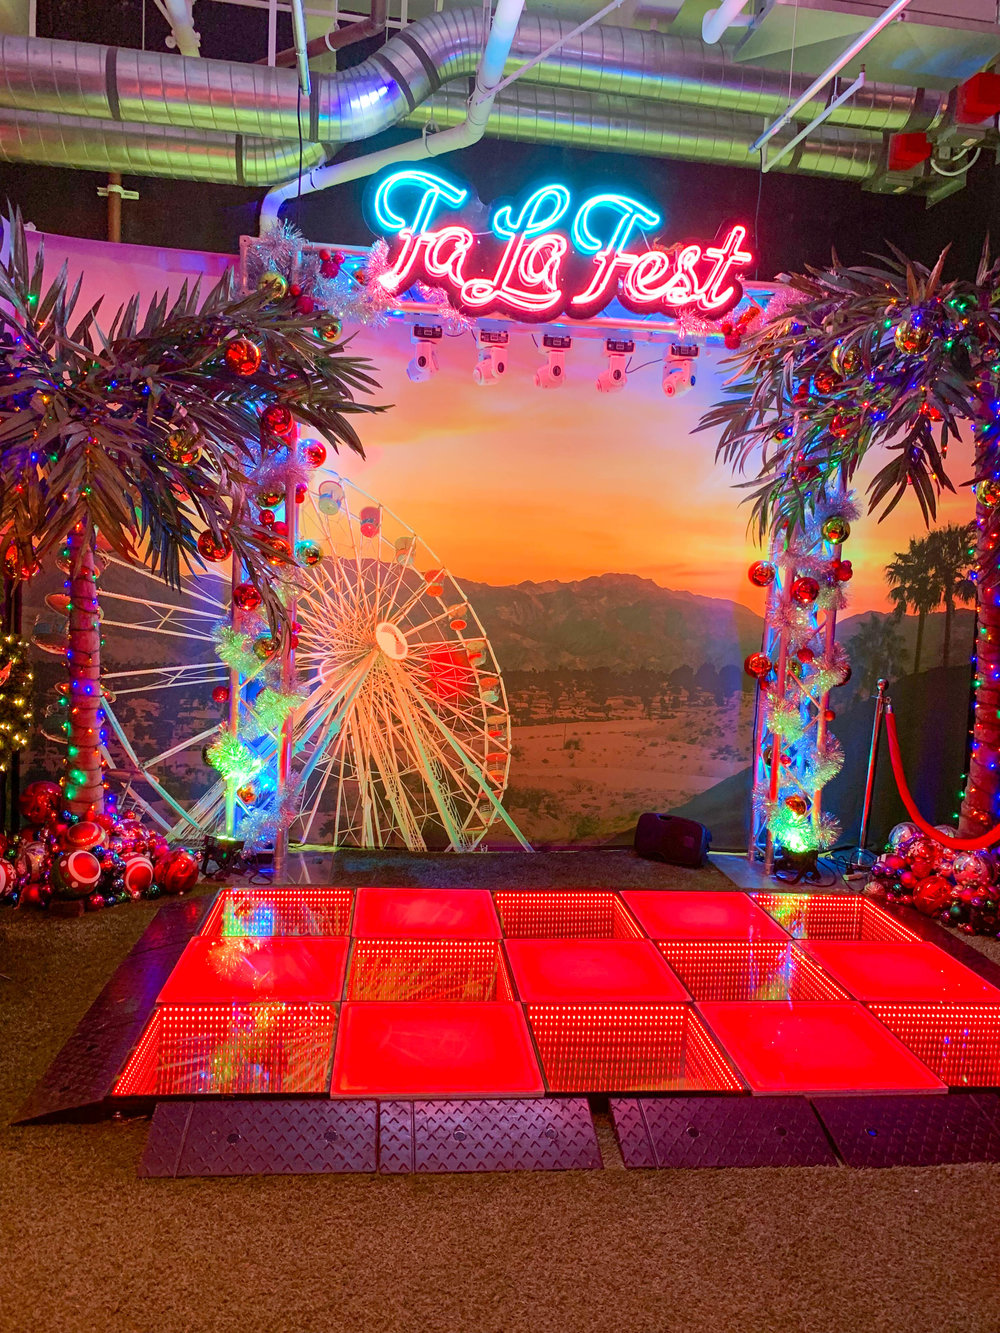 Fa La Land Pop Up Los Angeles- Fa La Fest